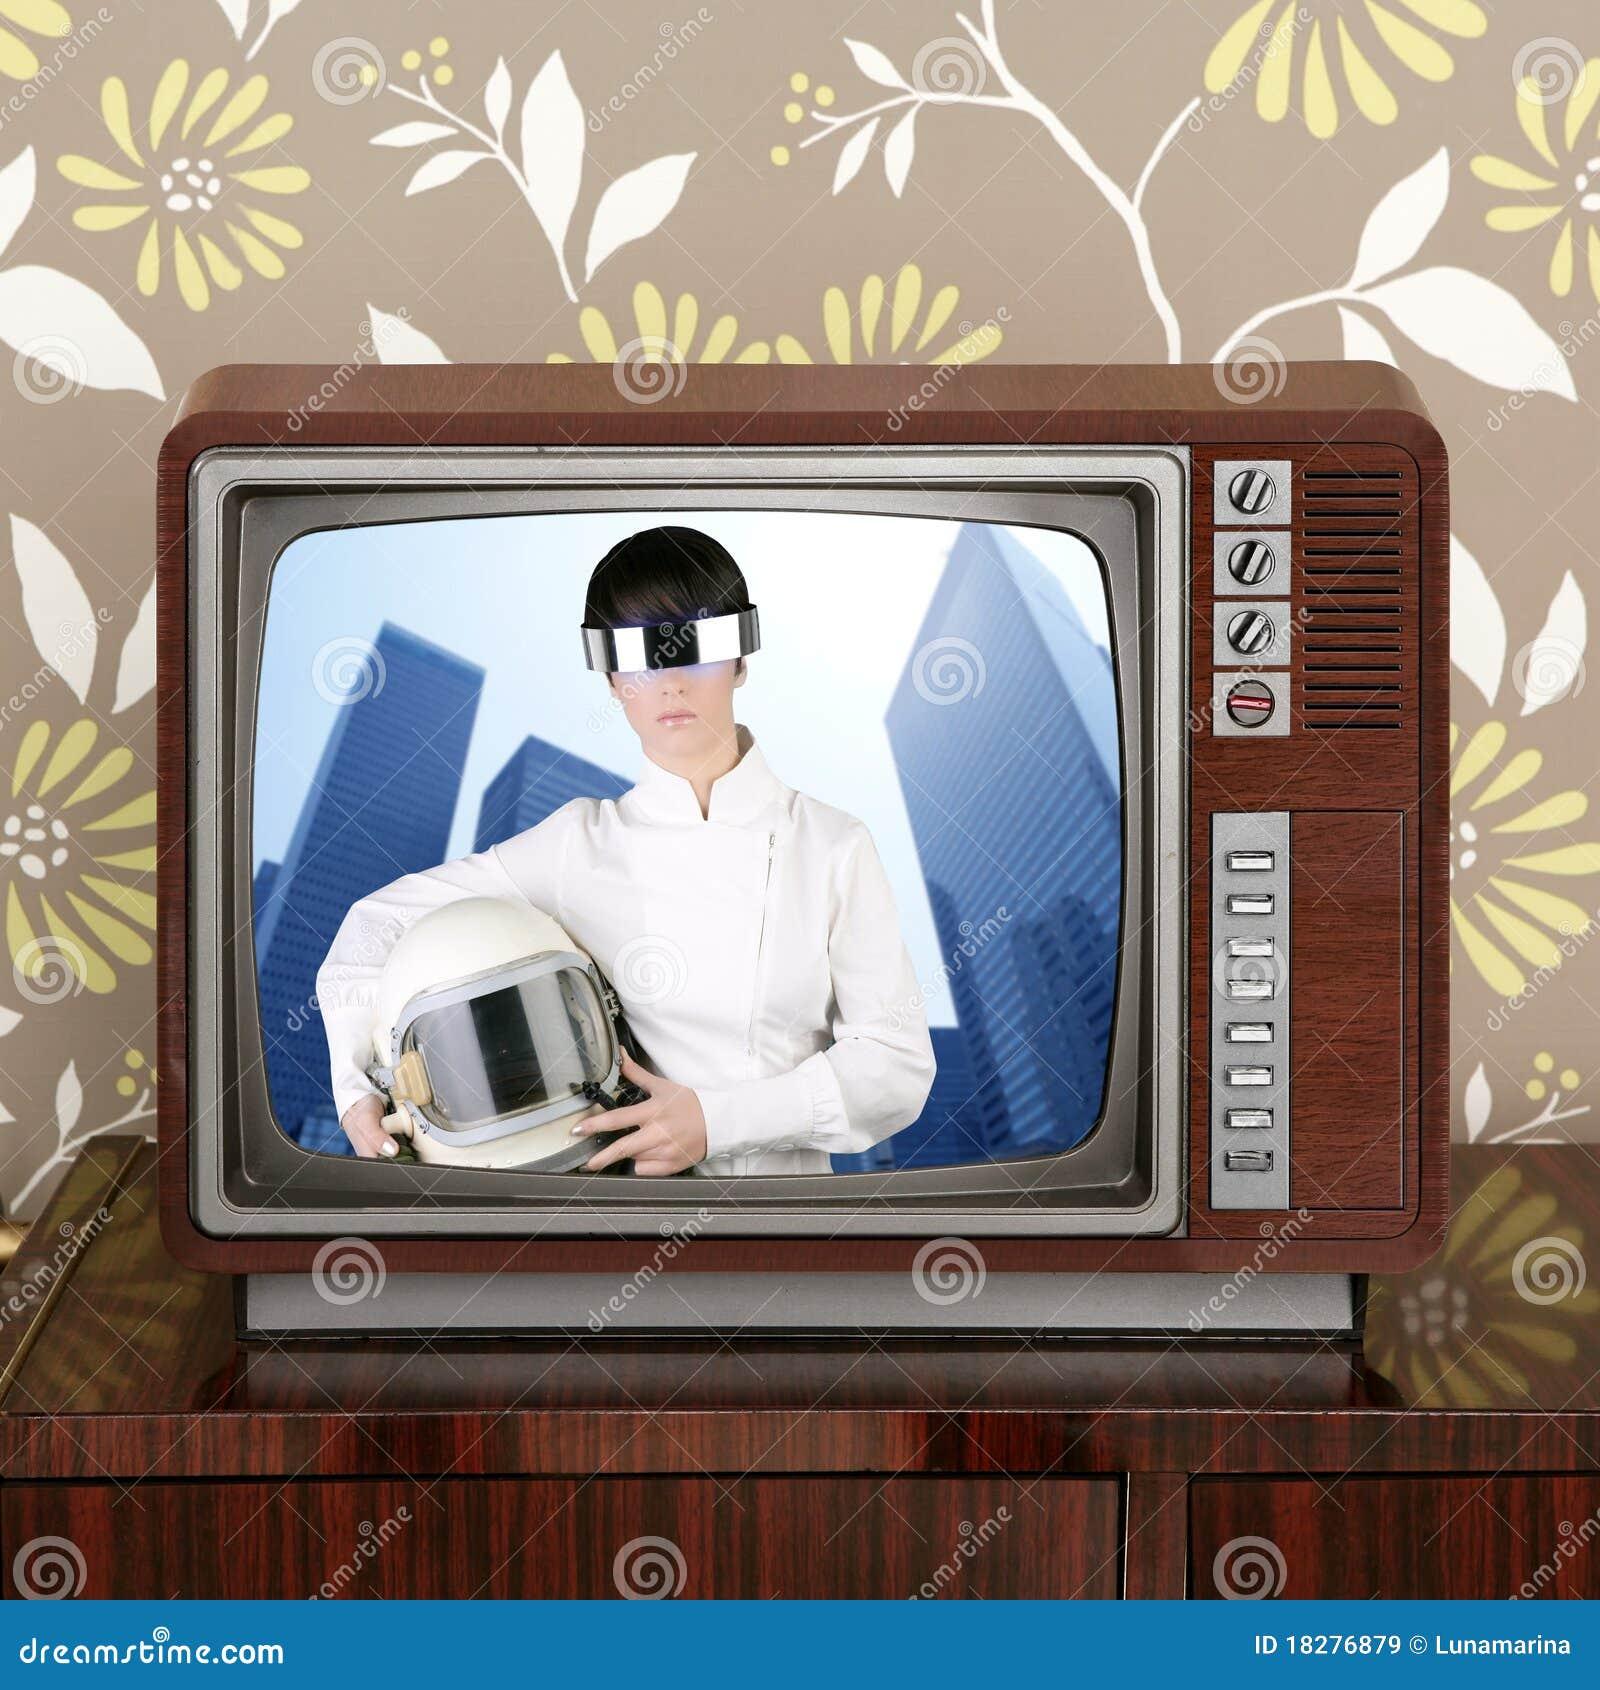 Futuristic retro contrast vintage tv future woman